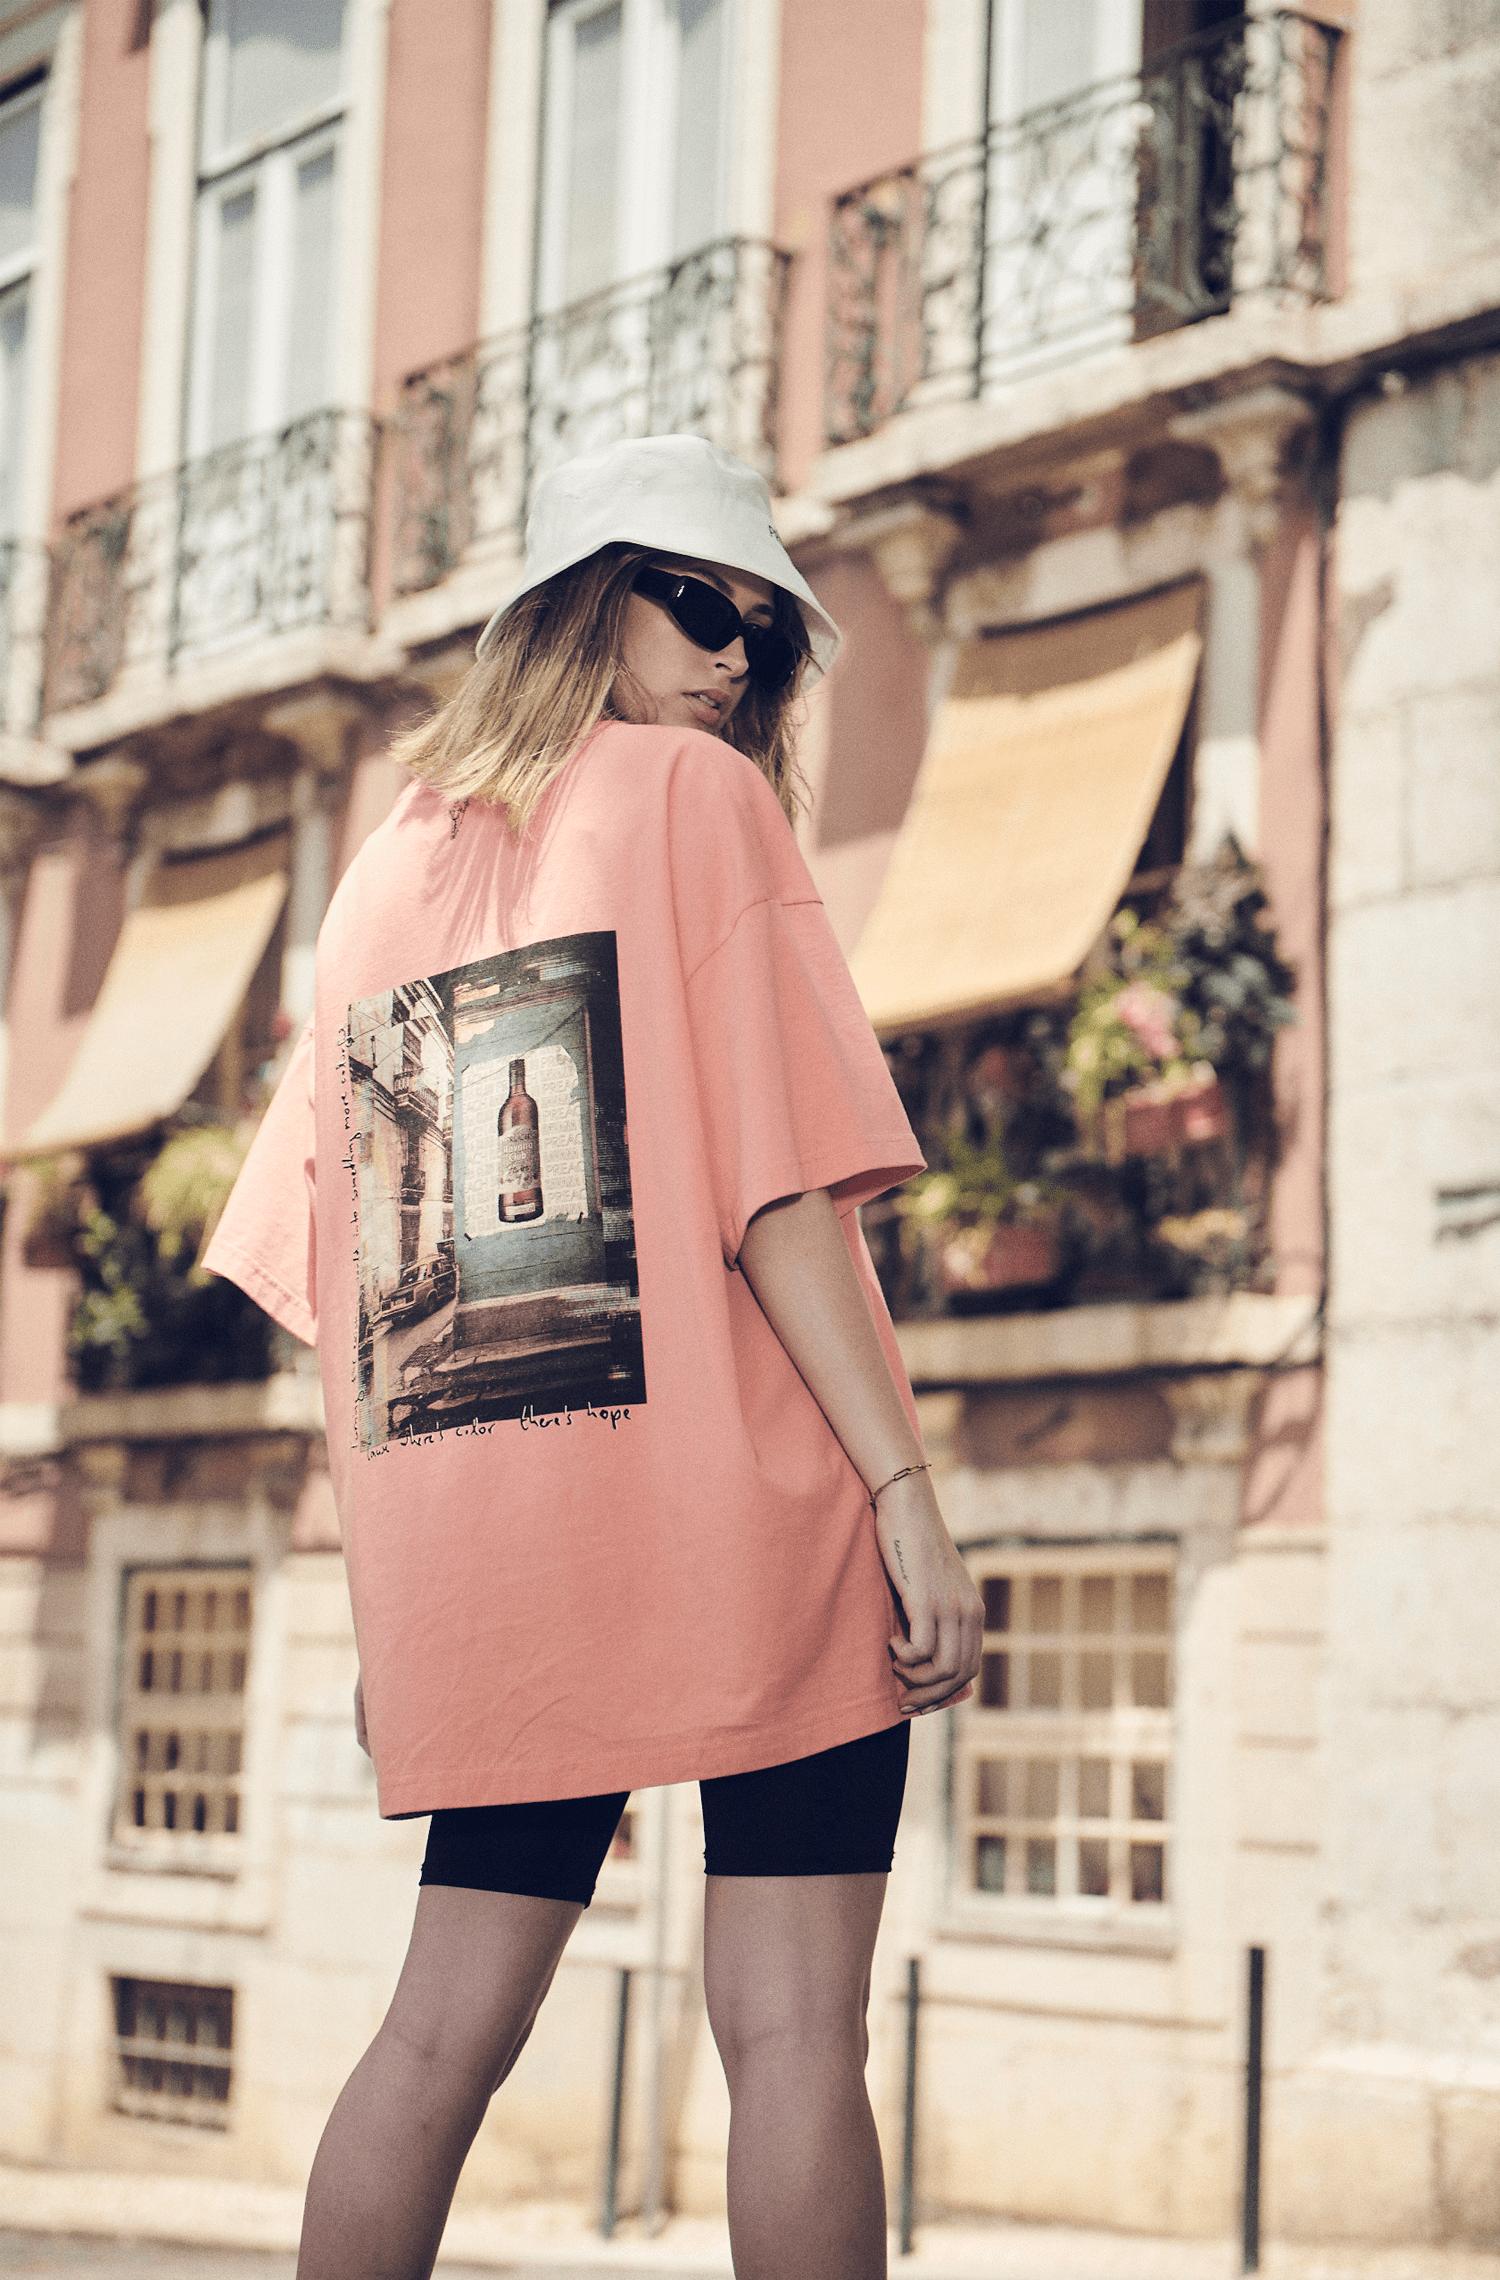 Havana Club x Preach Fashion Kooperation